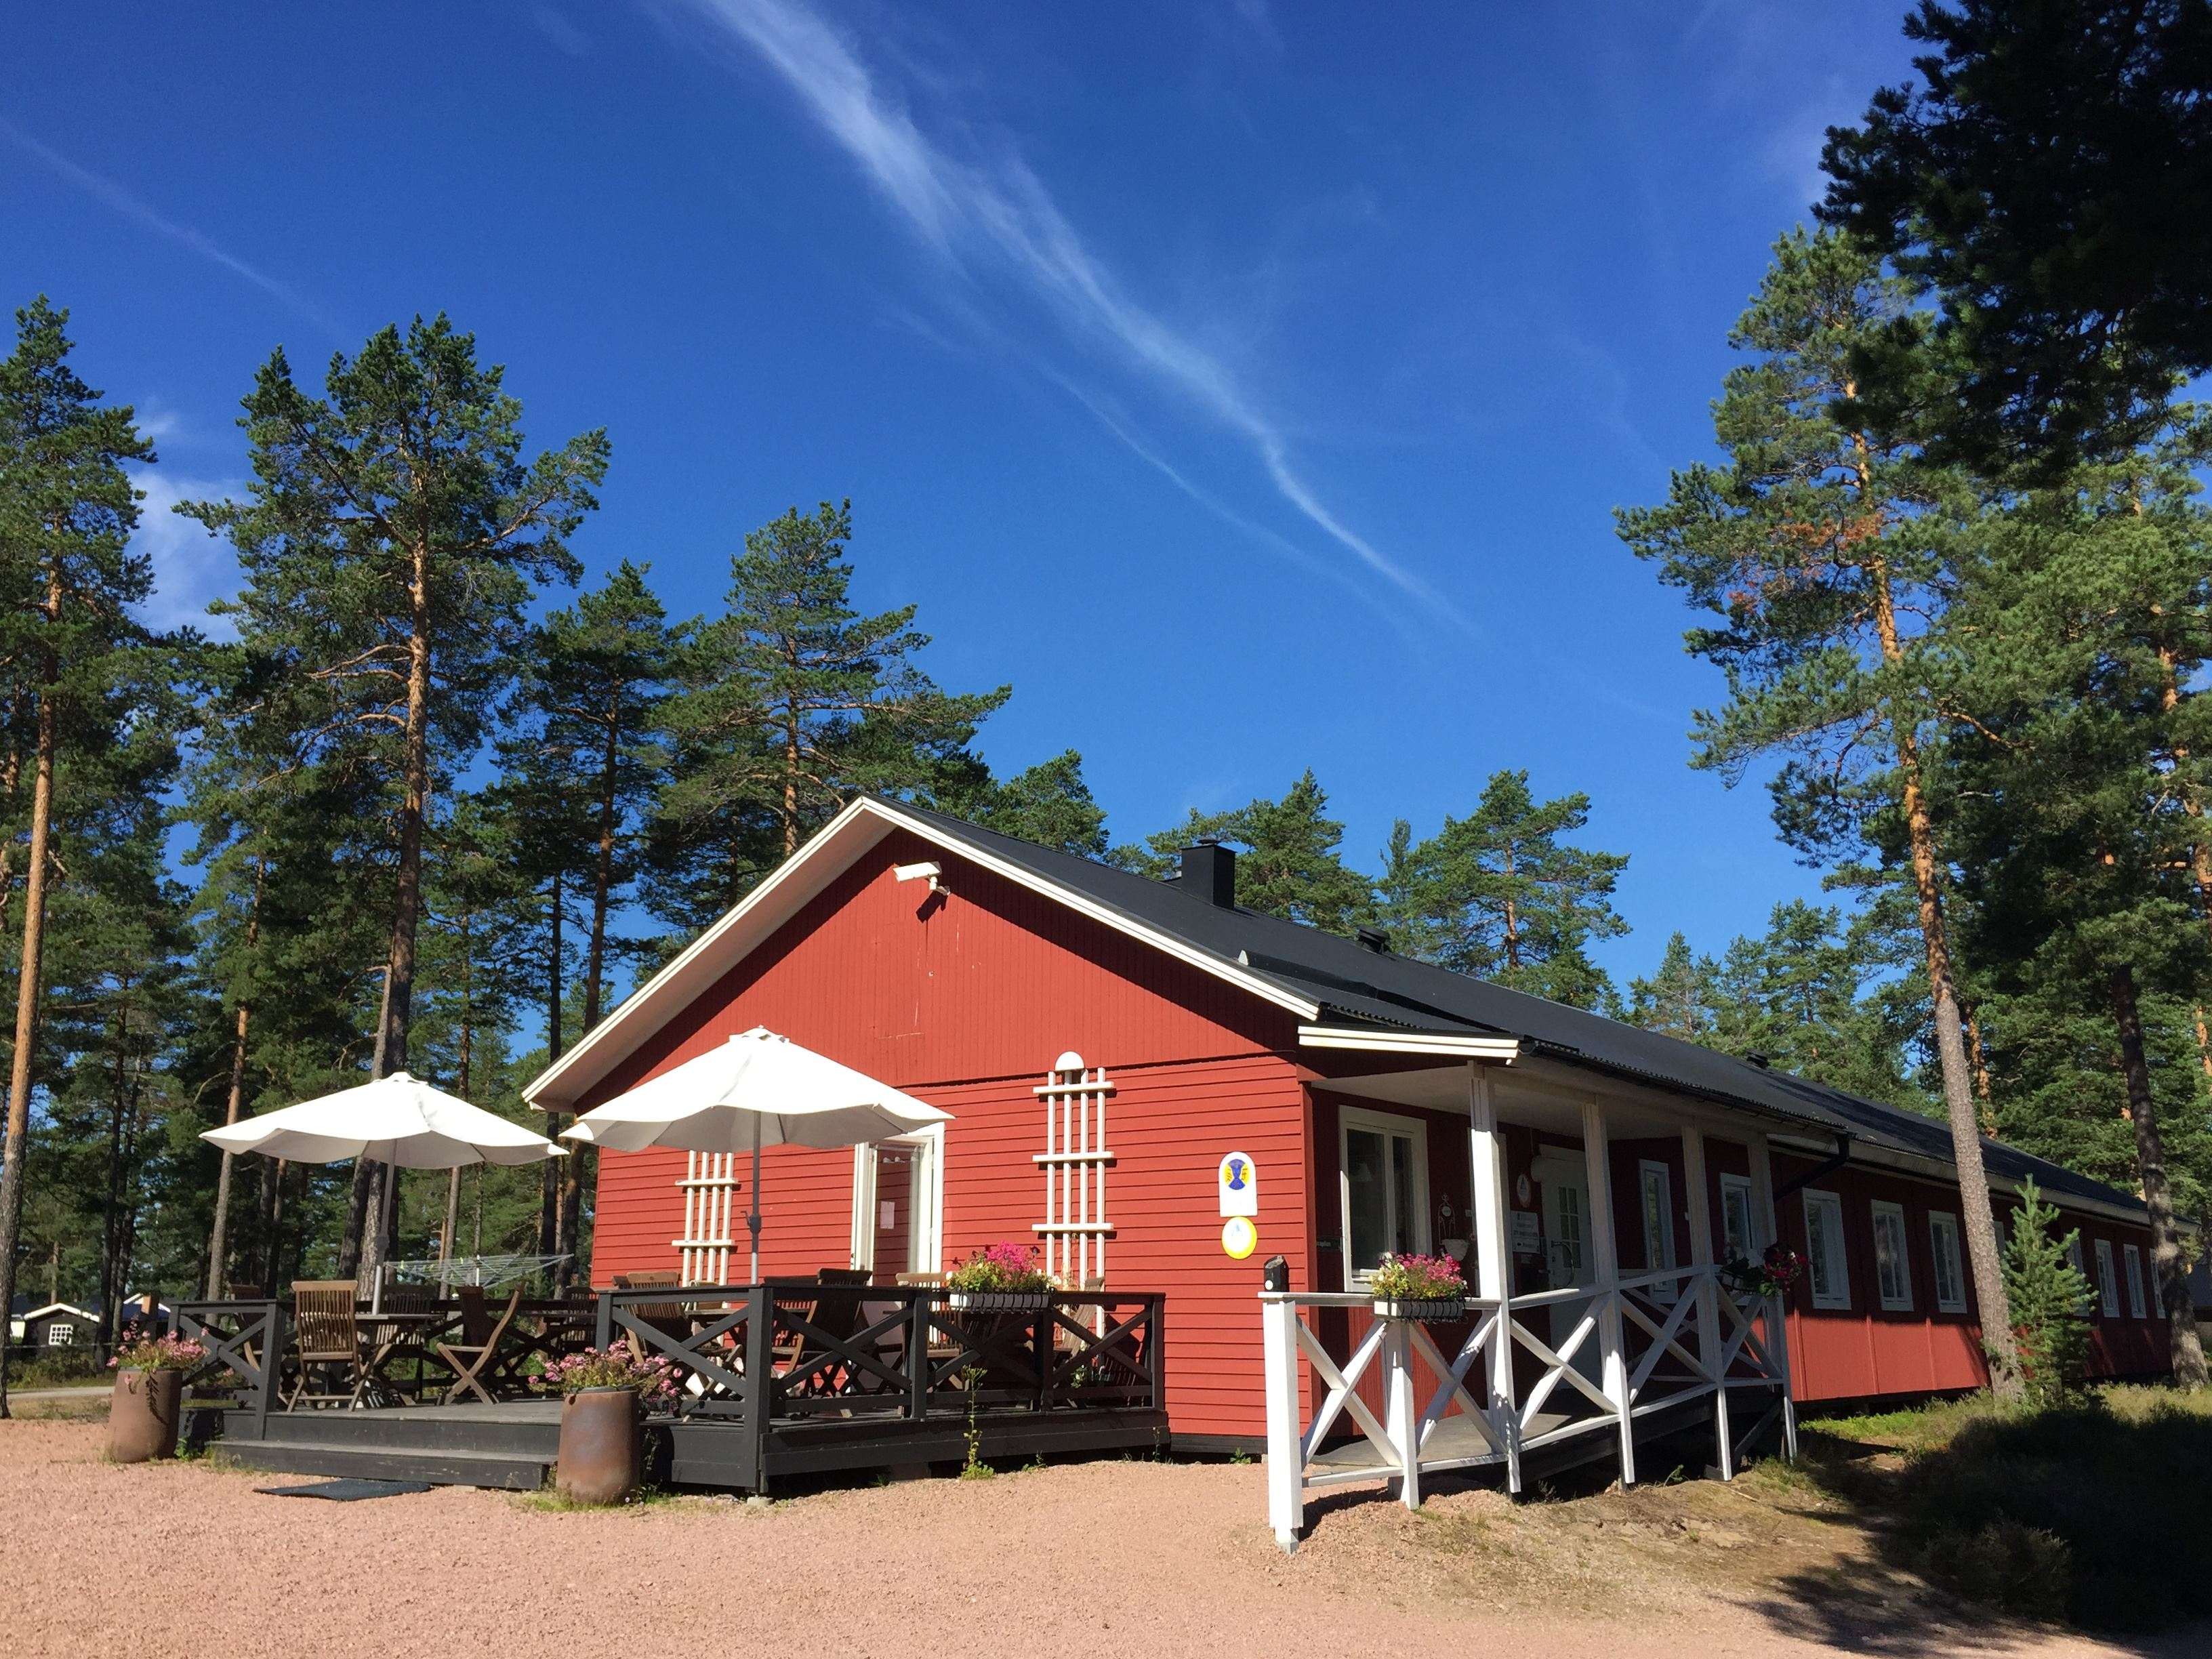 Malnbadens Camping/Vandrarhem